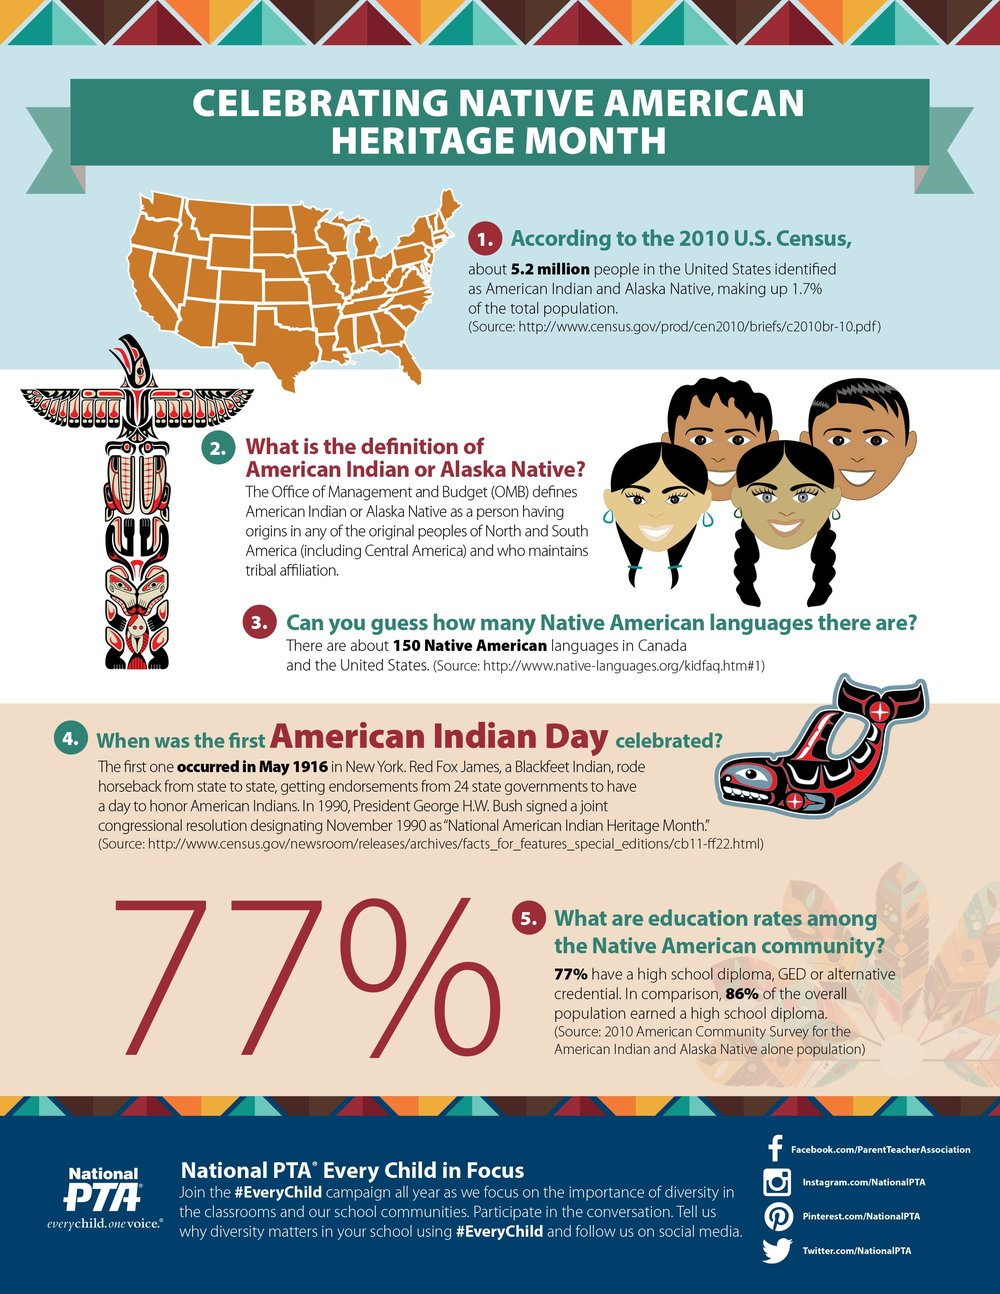 ECIF-NativeAmericanHeritageMonth1.jpg